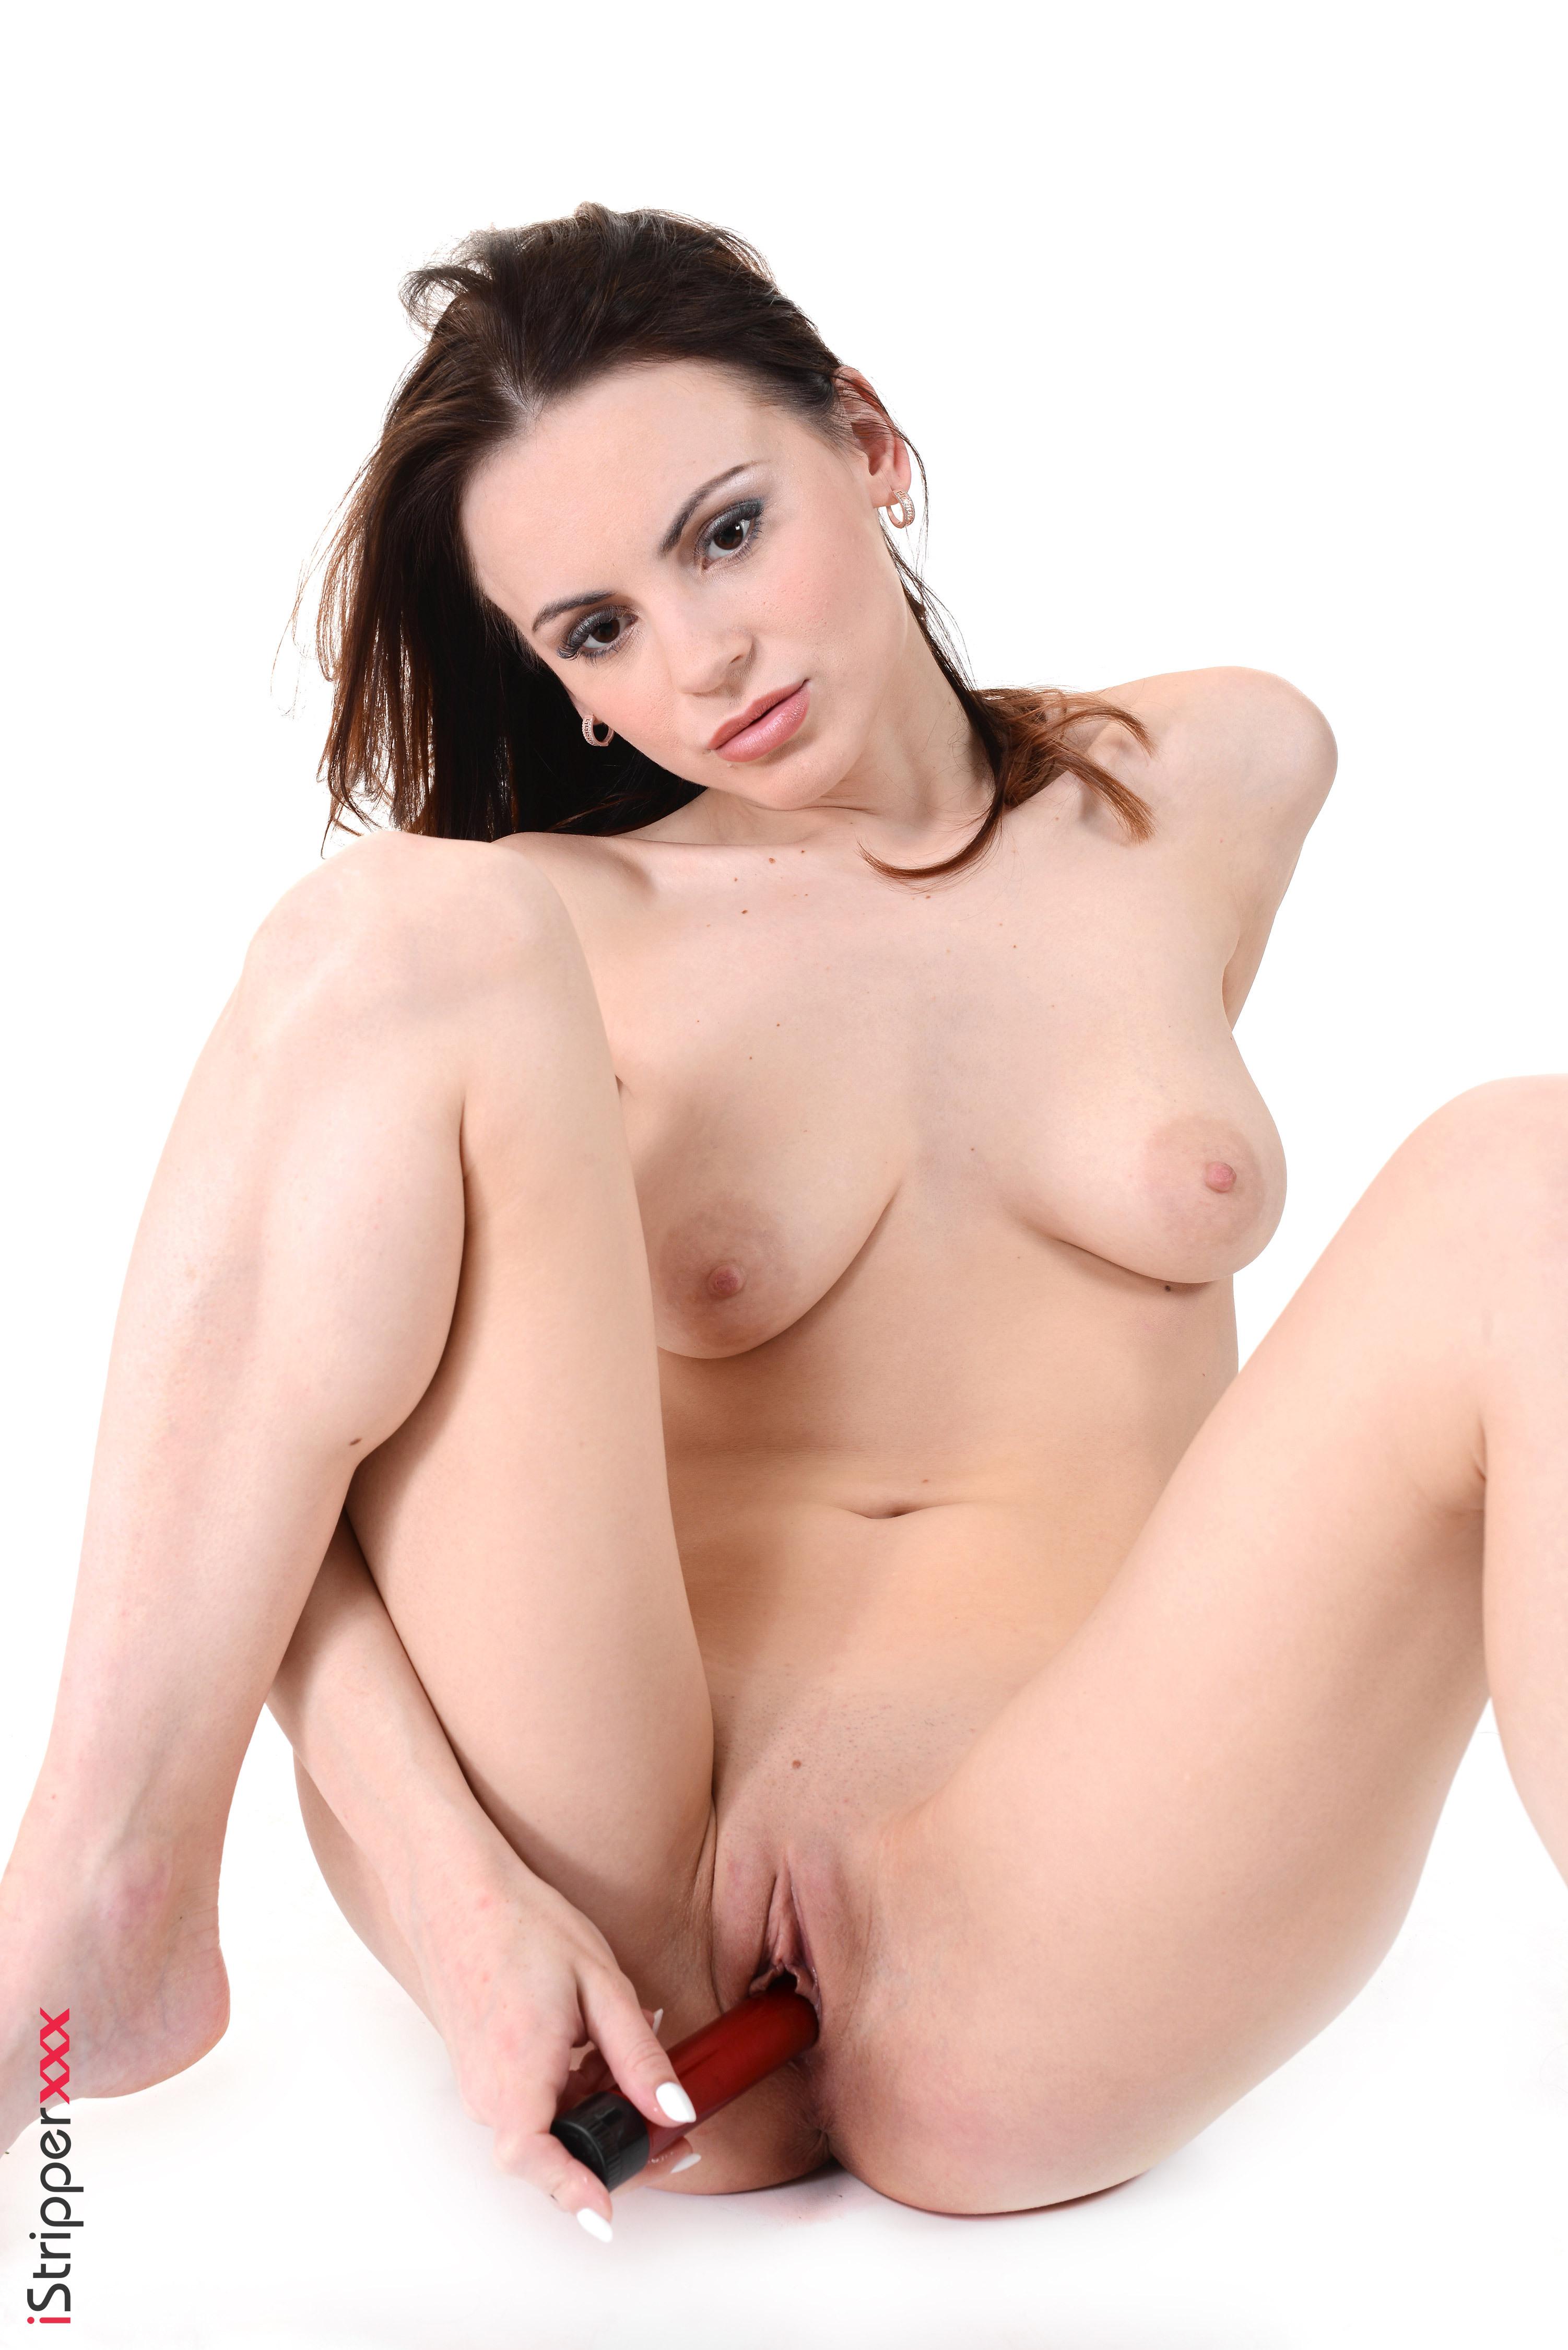 free naked girls wallpapers